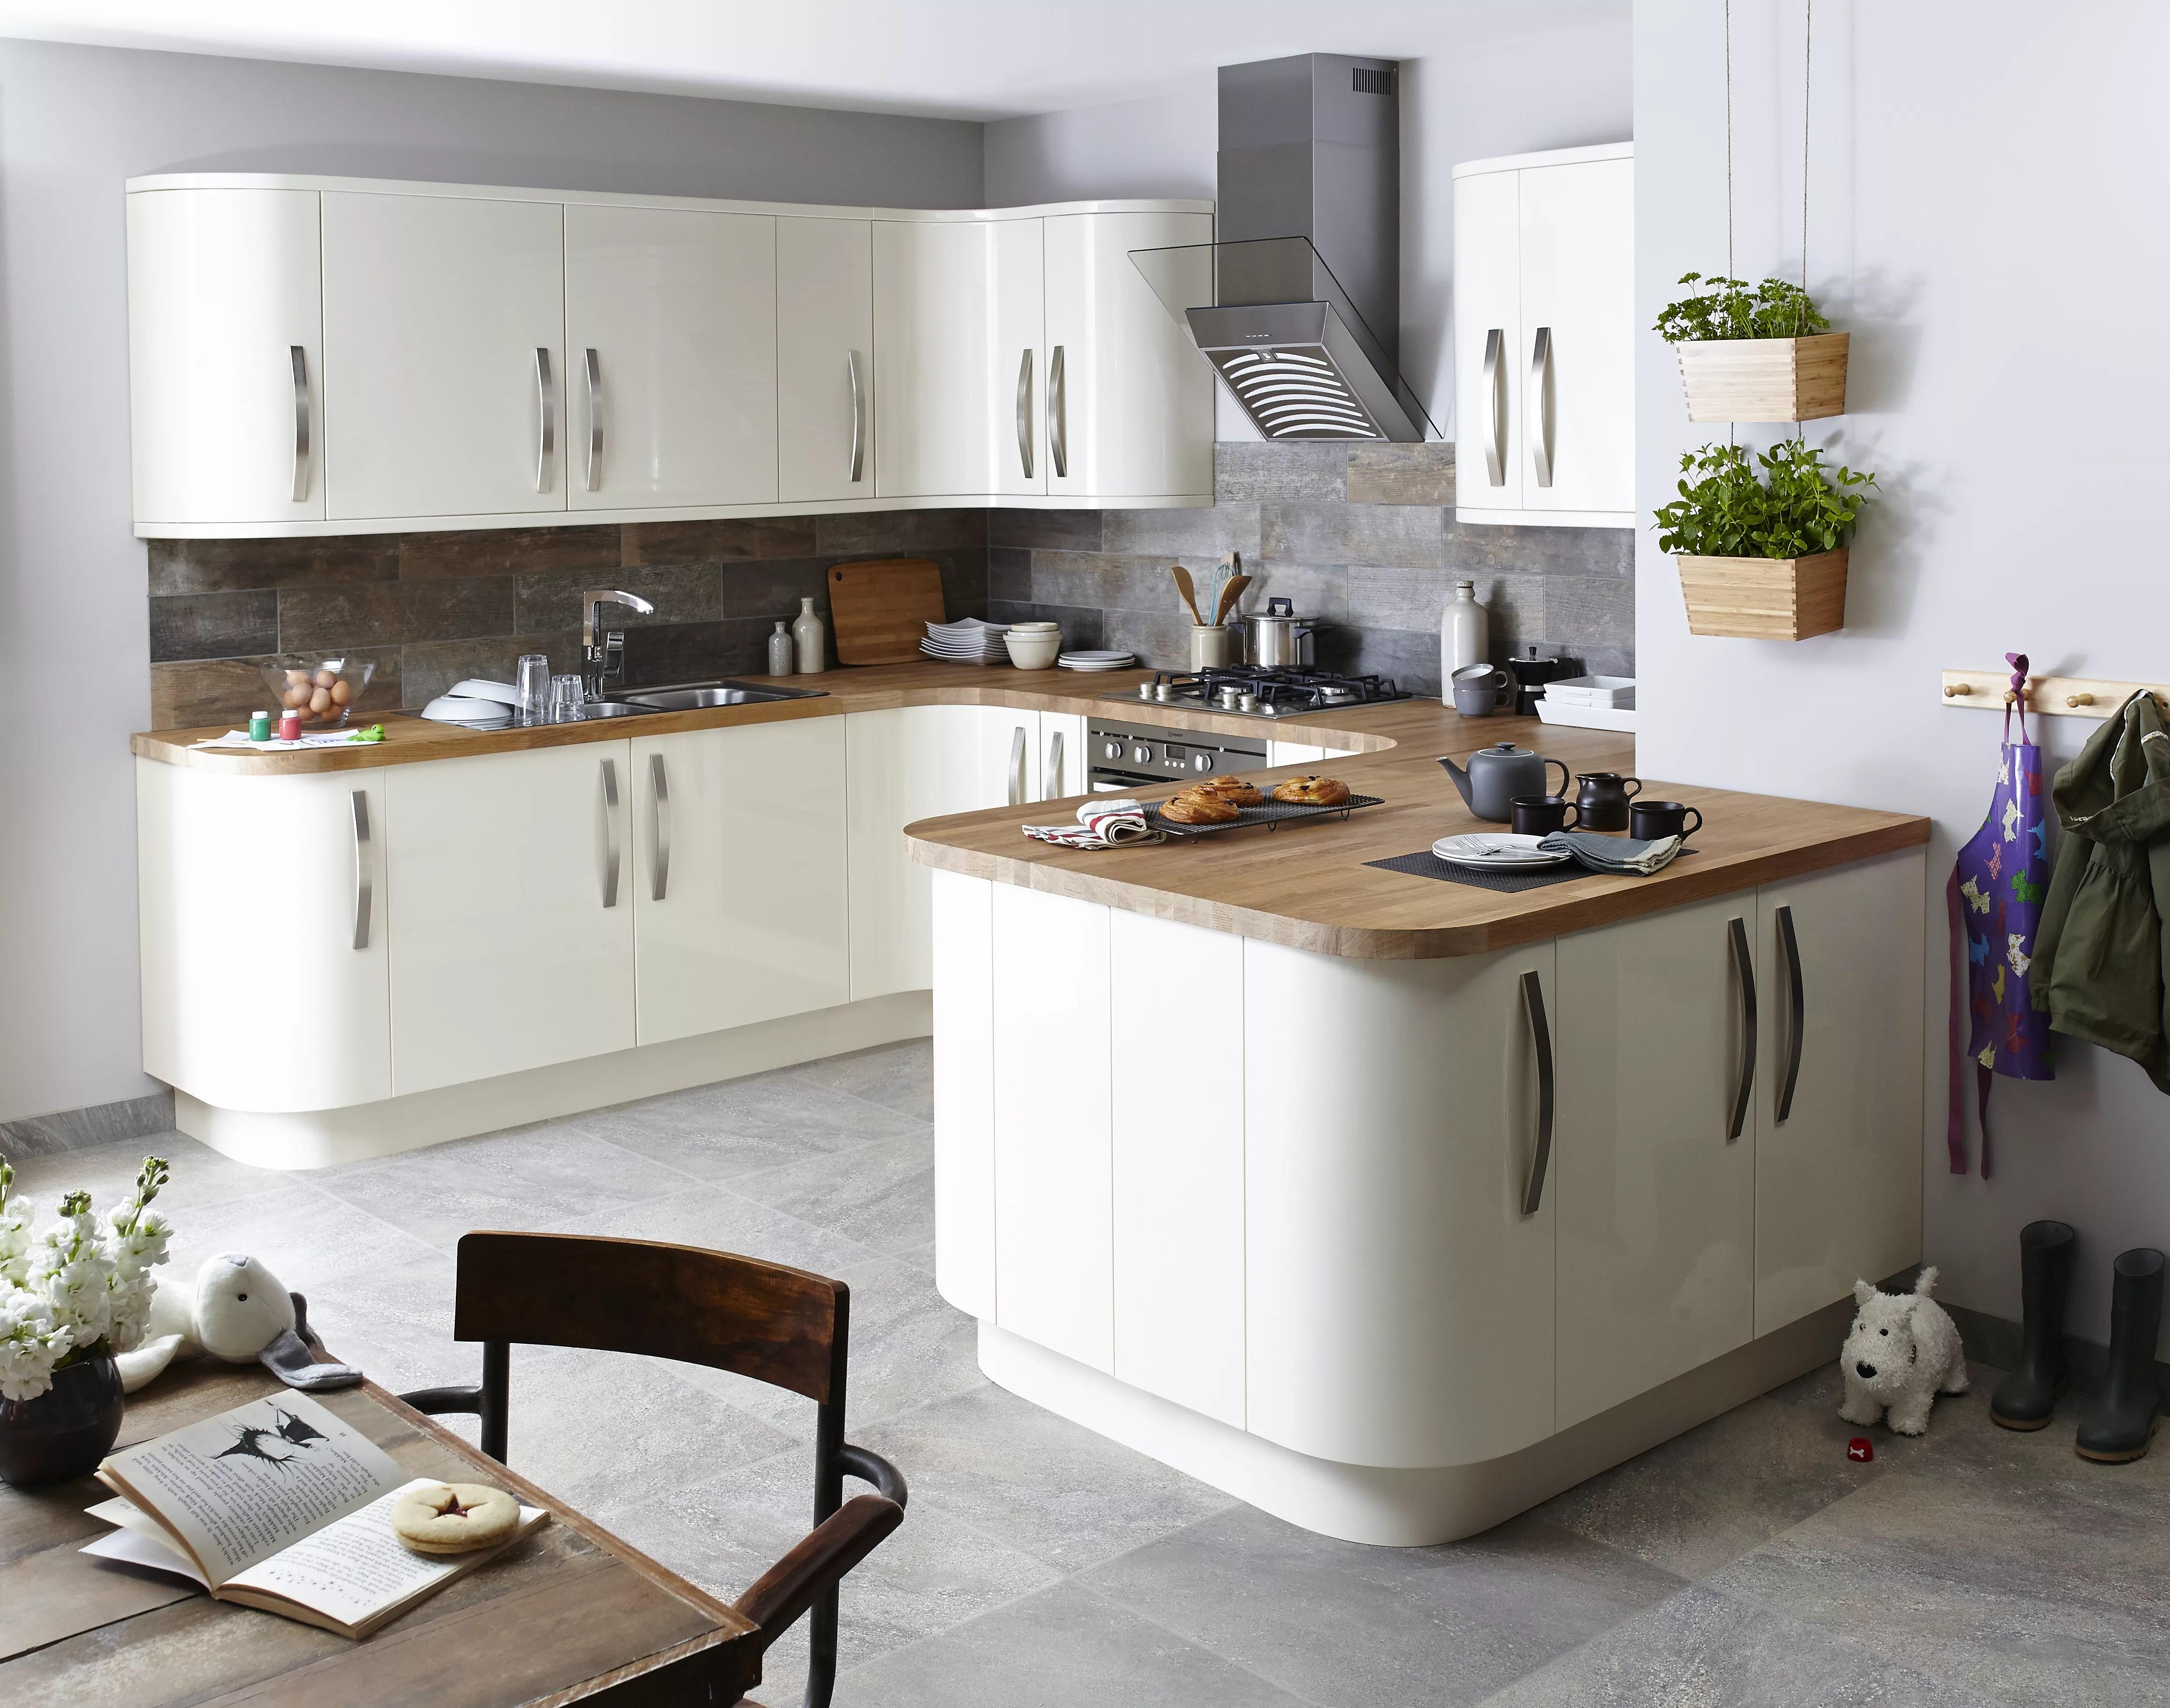 b&q kitchens lights under kitchen cabinets it santini gloss cream slab fitted diy at b q